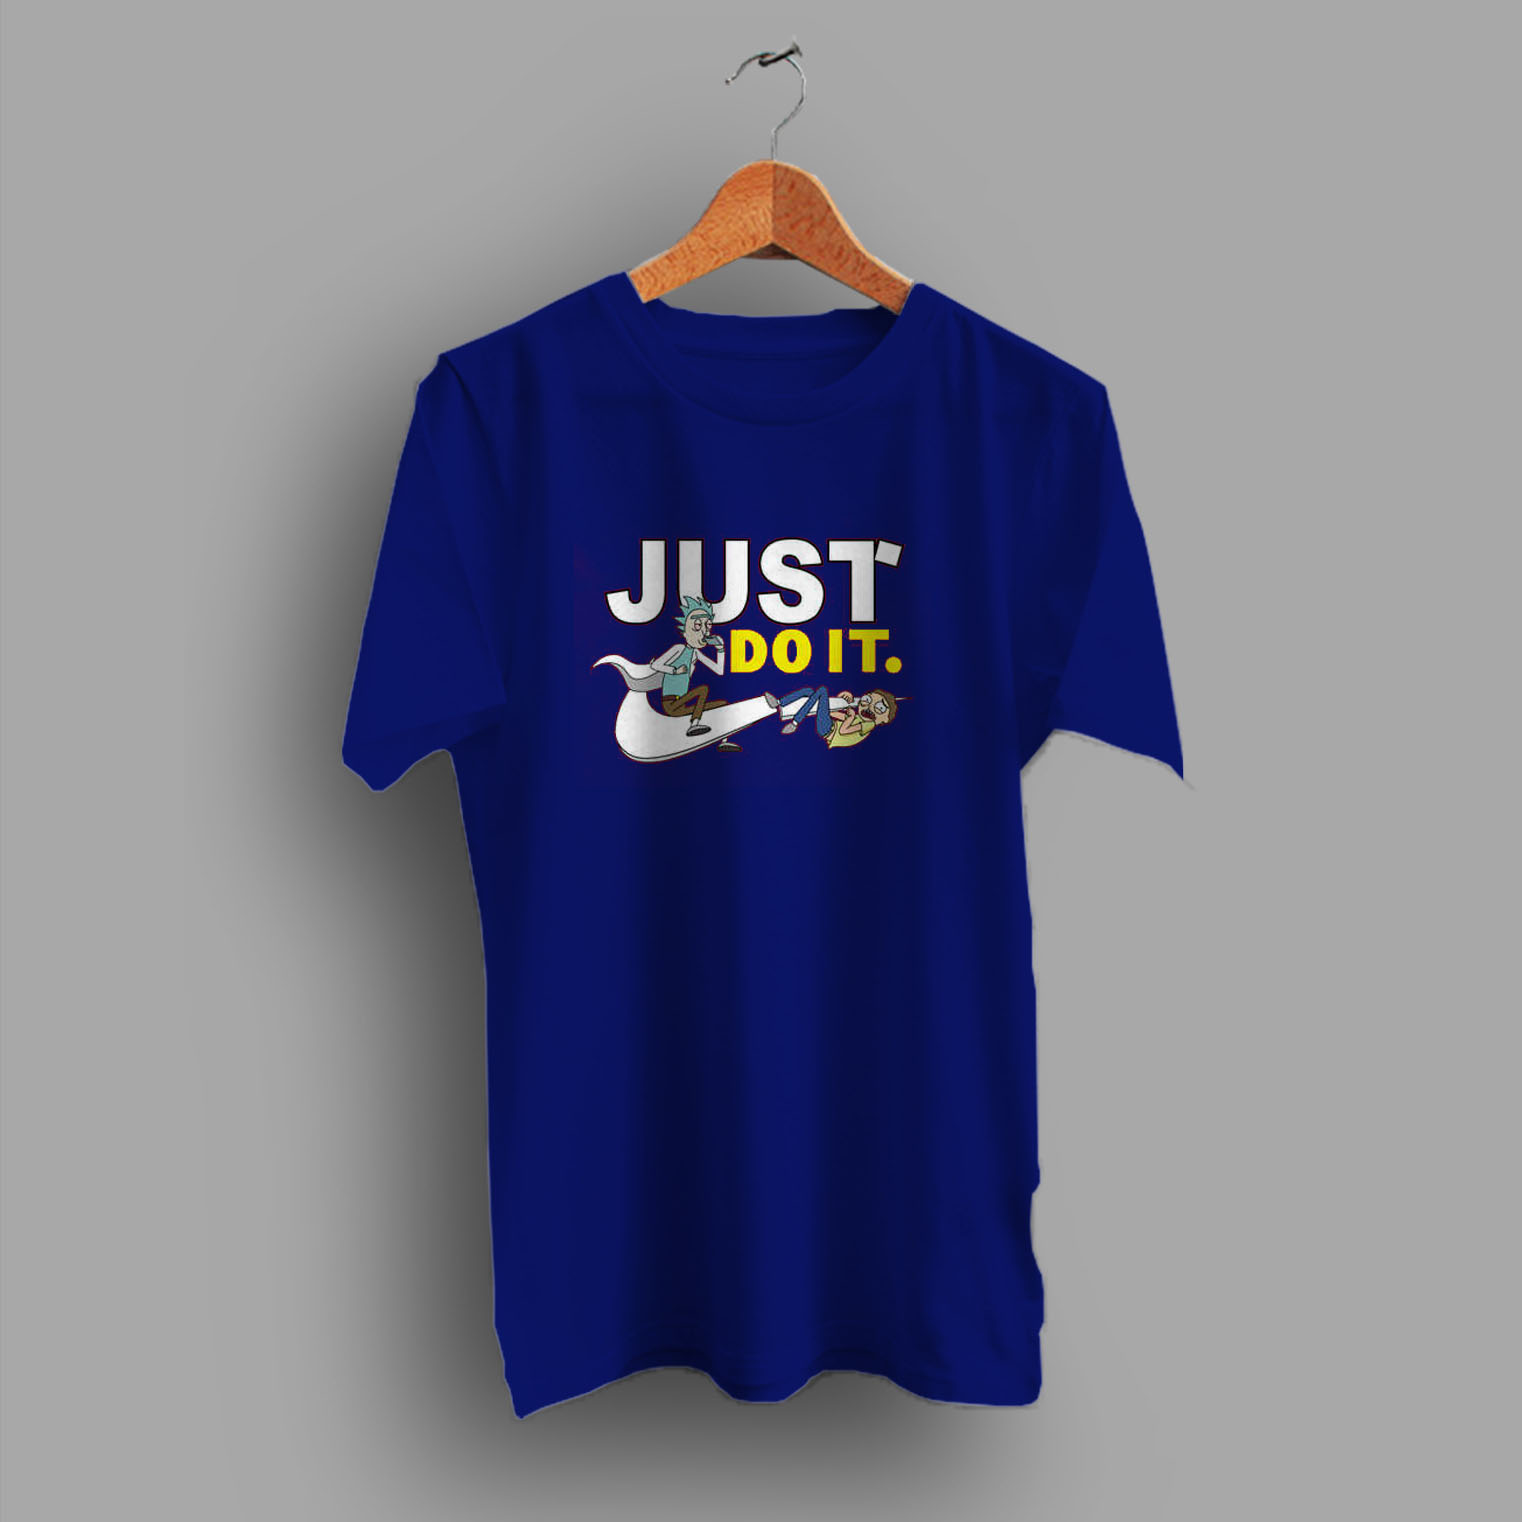 1a3a8bd55 Funny Rick Morty Just Do It Parody T Shirt - Hotvero